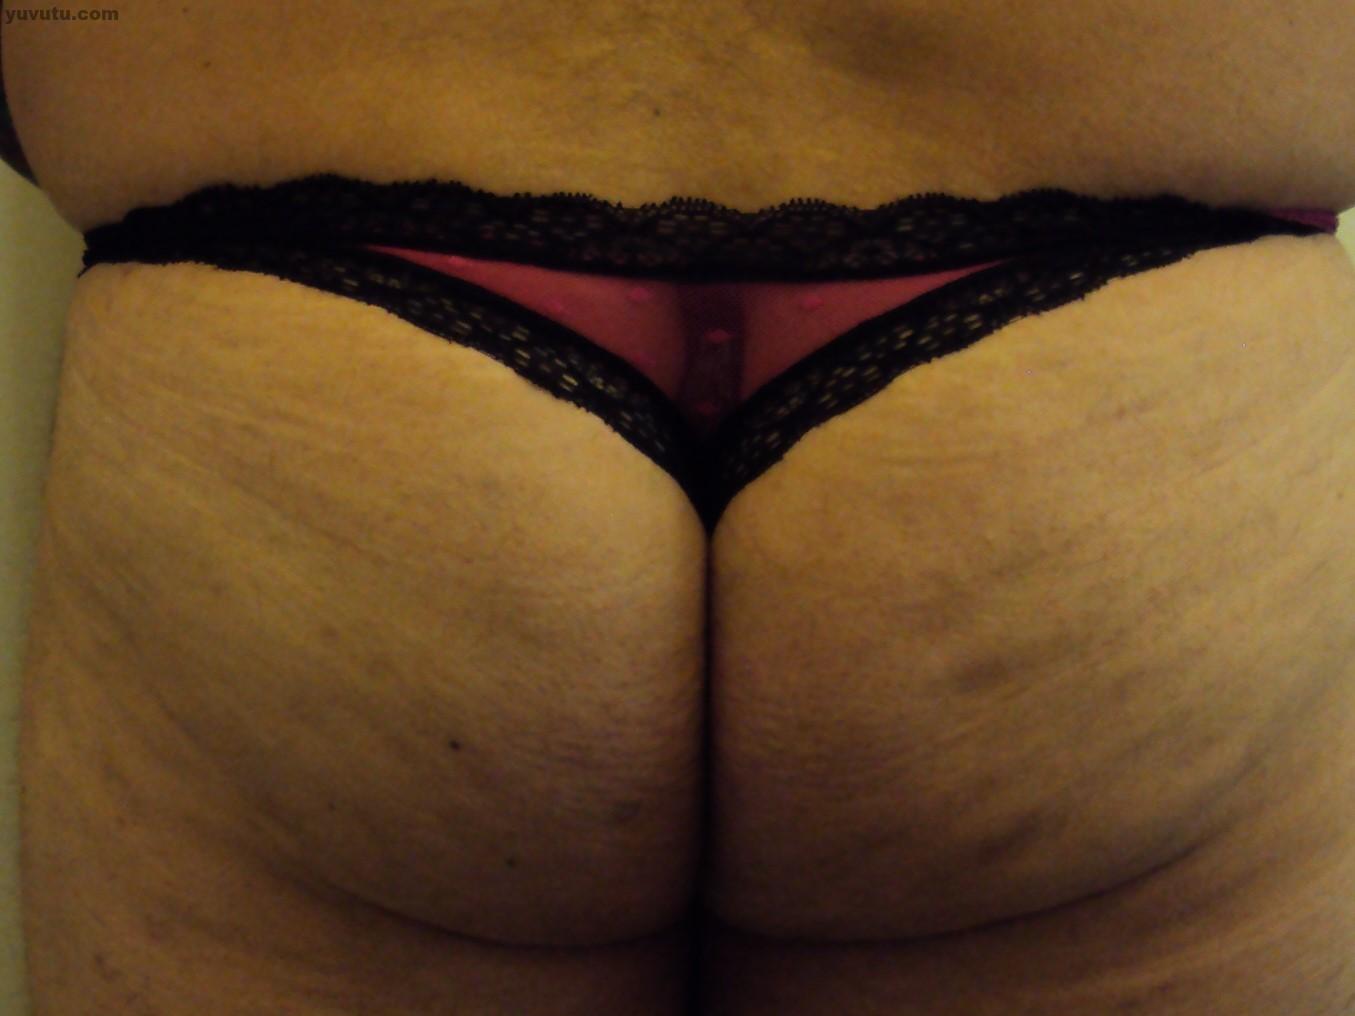 See through panties porn movies amateur lingerie sex videos 4